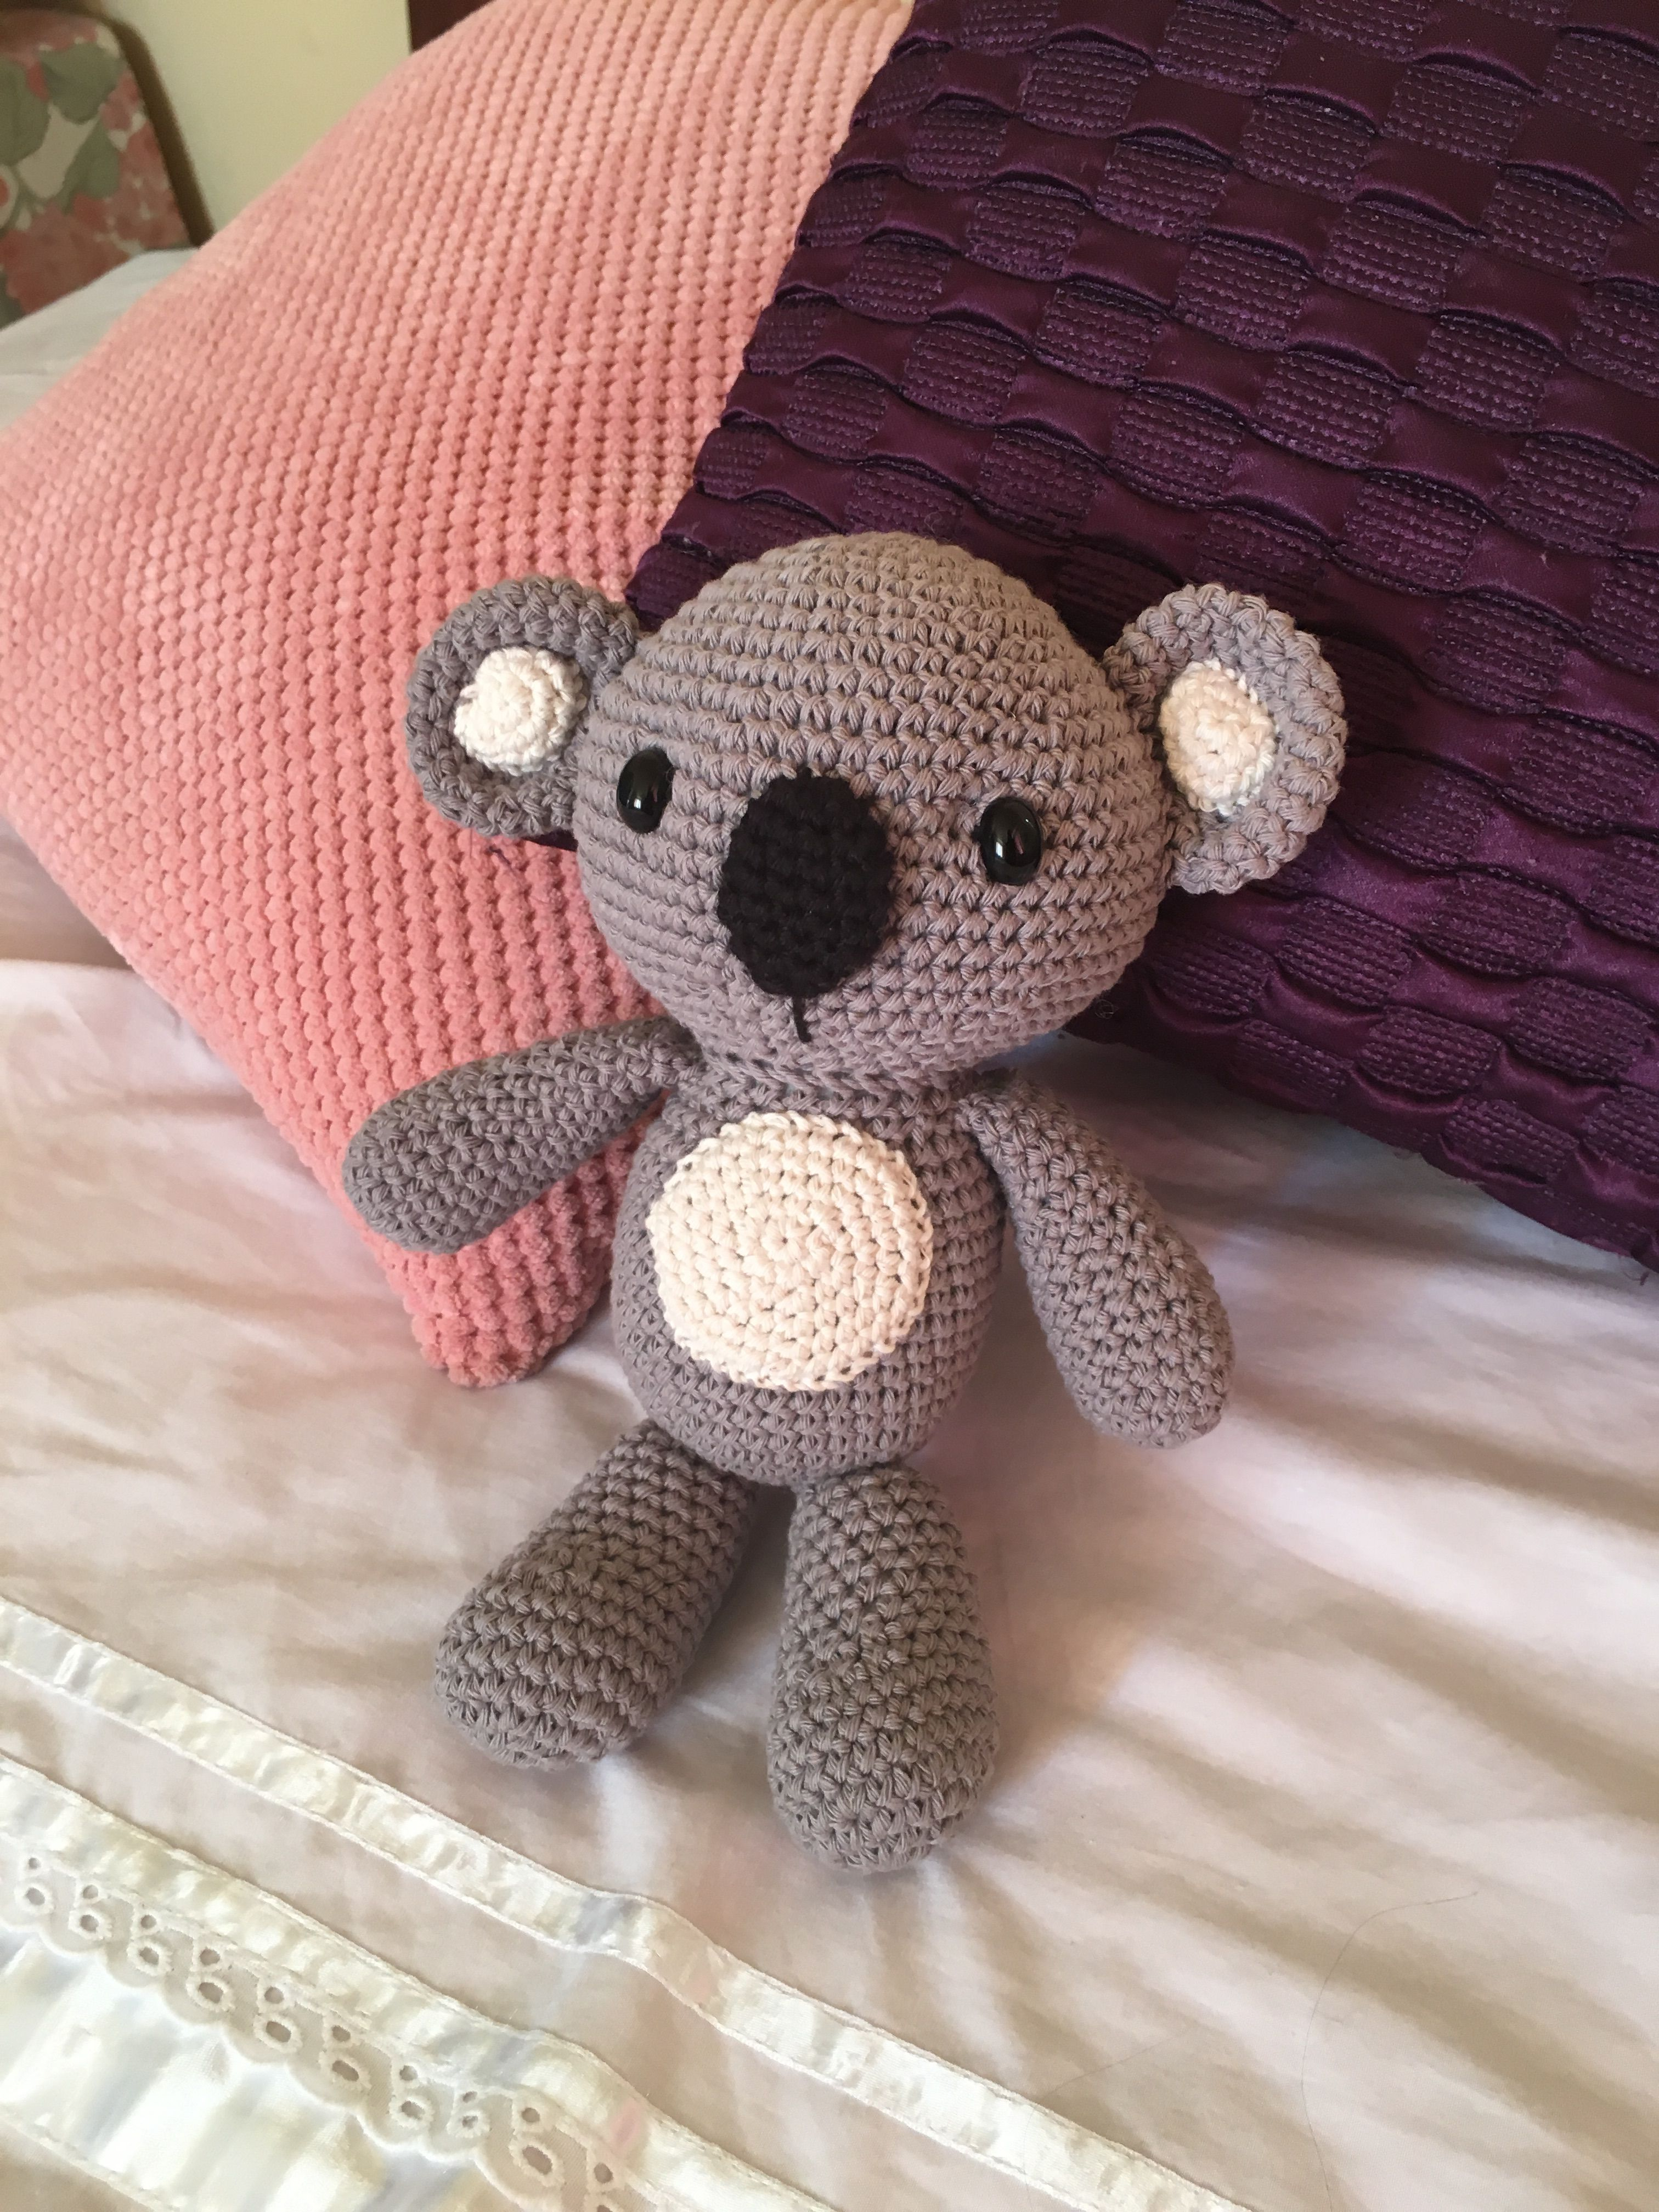 Oso koala crochet pattern amigurumi